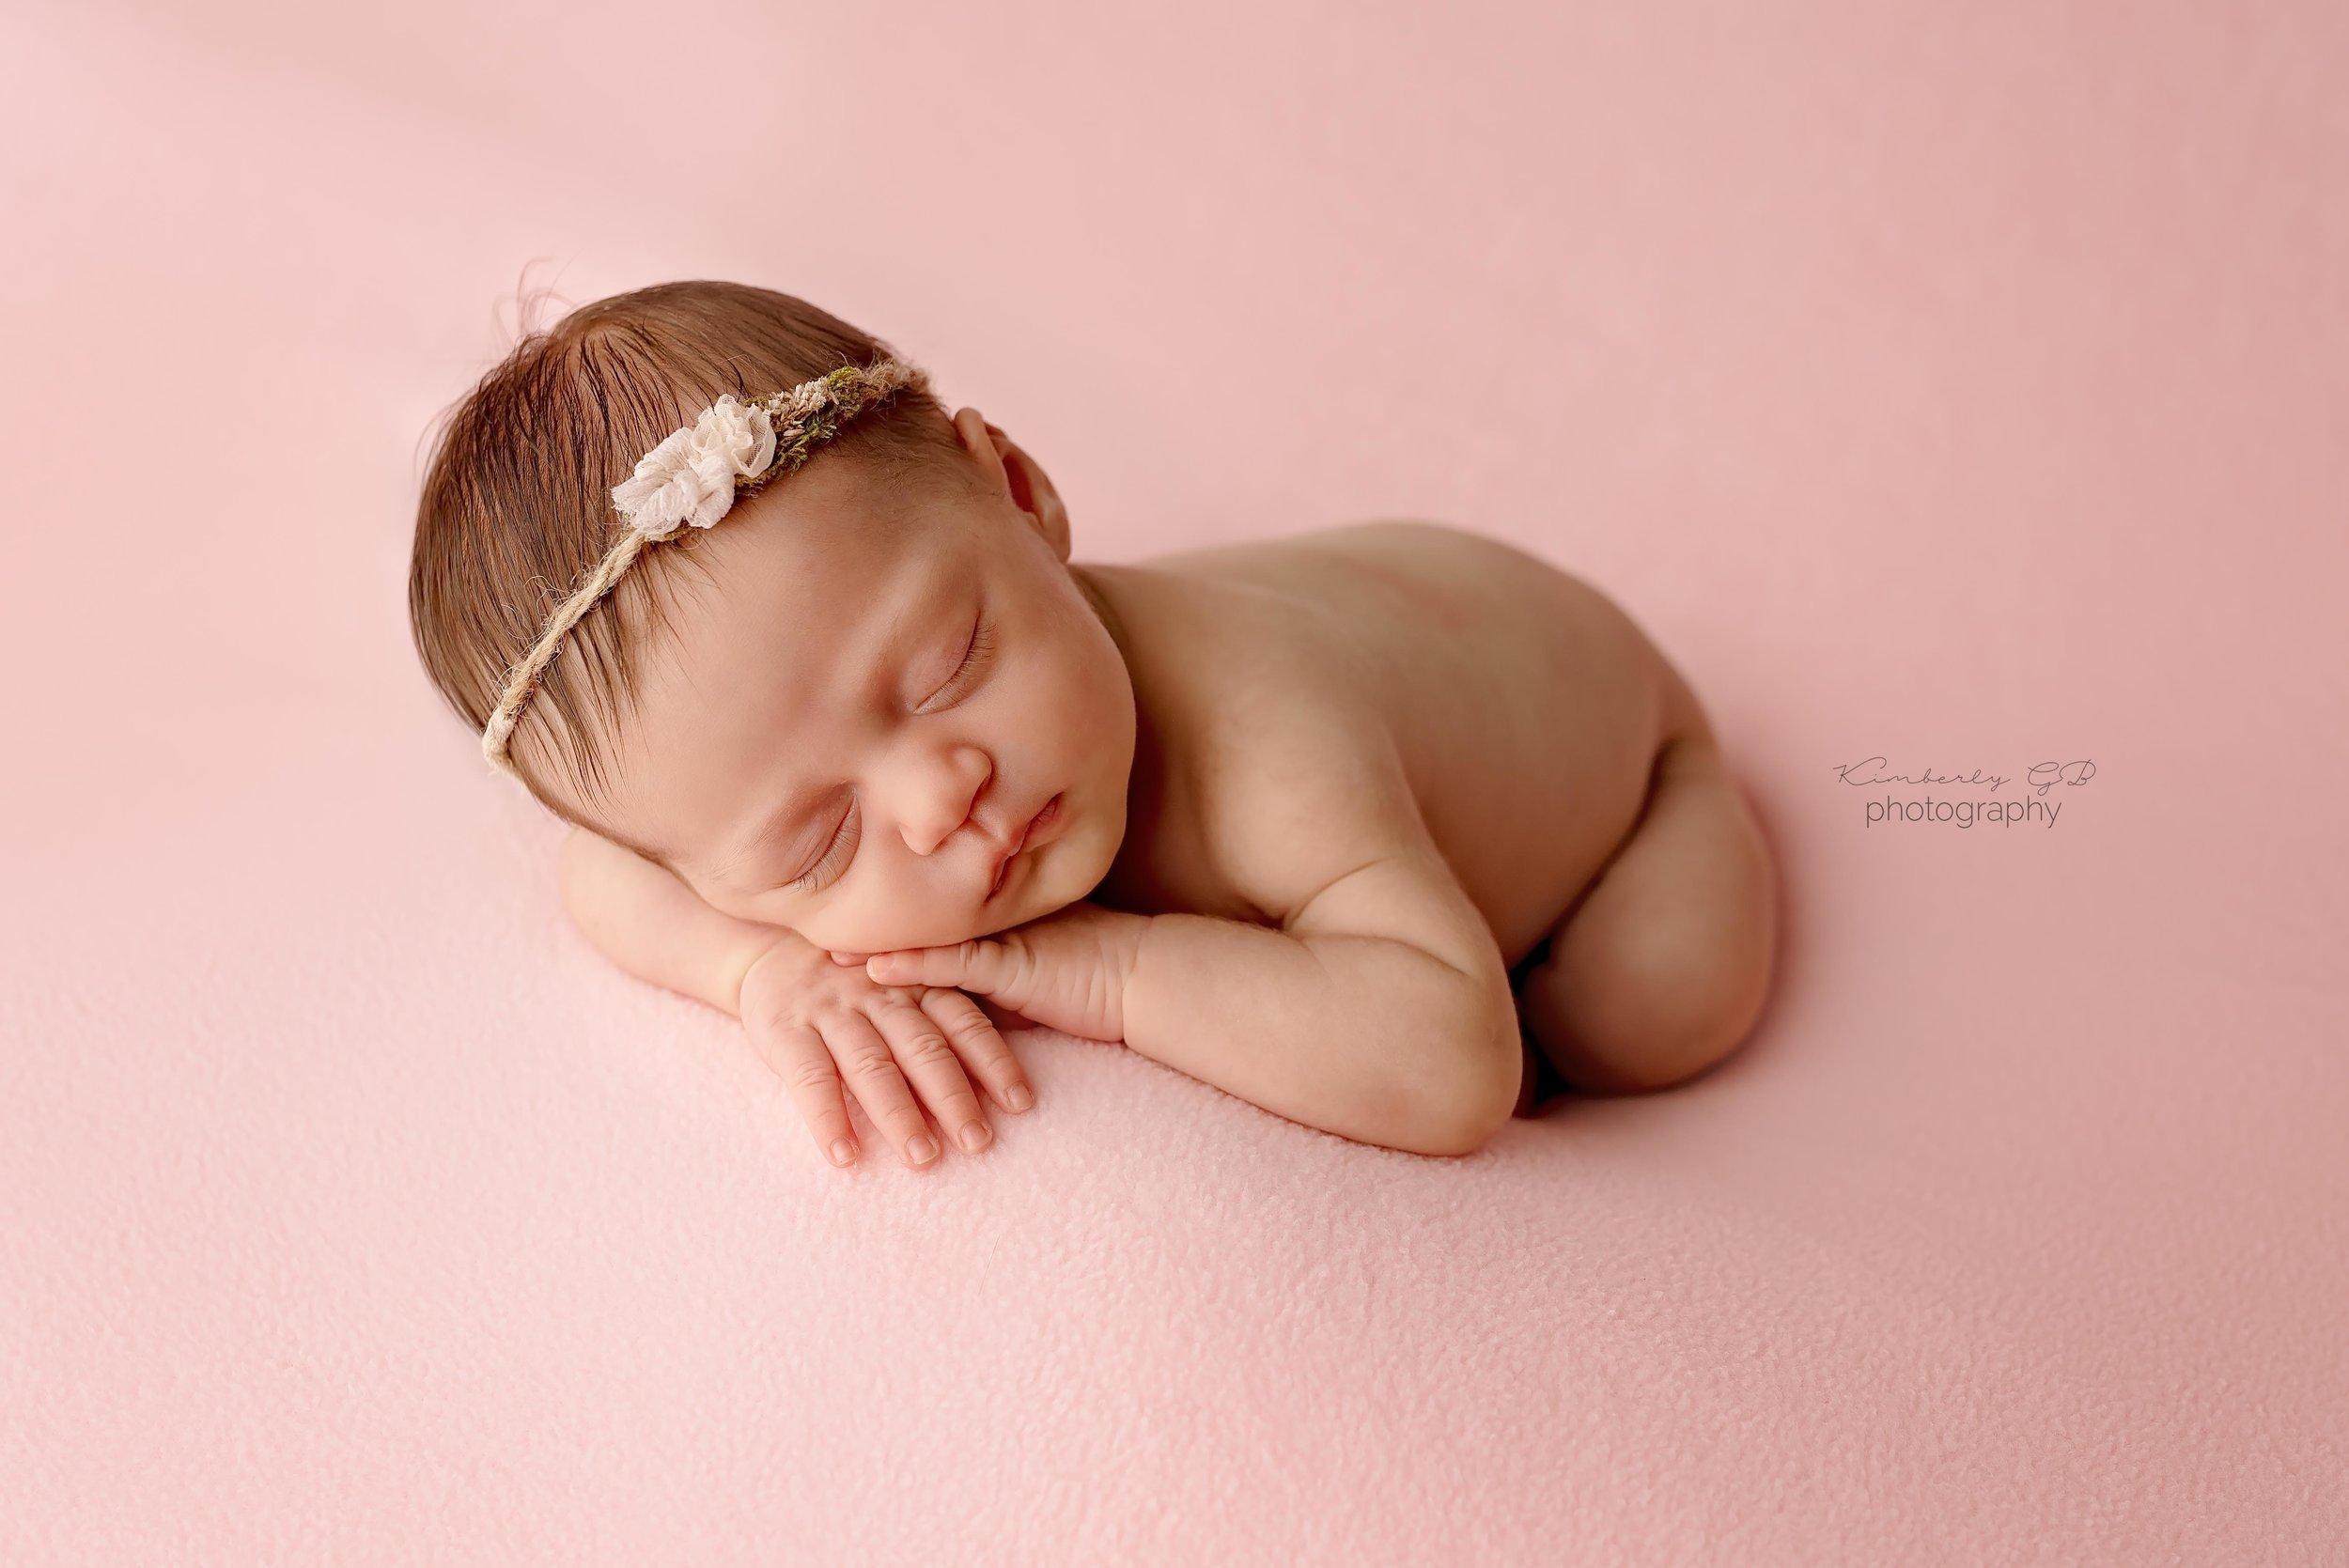 fotografia-de-recien-nacidos-bebes-newborn-en-puerto-rico-kimberly-gb-photography-fotografa-244.jpg